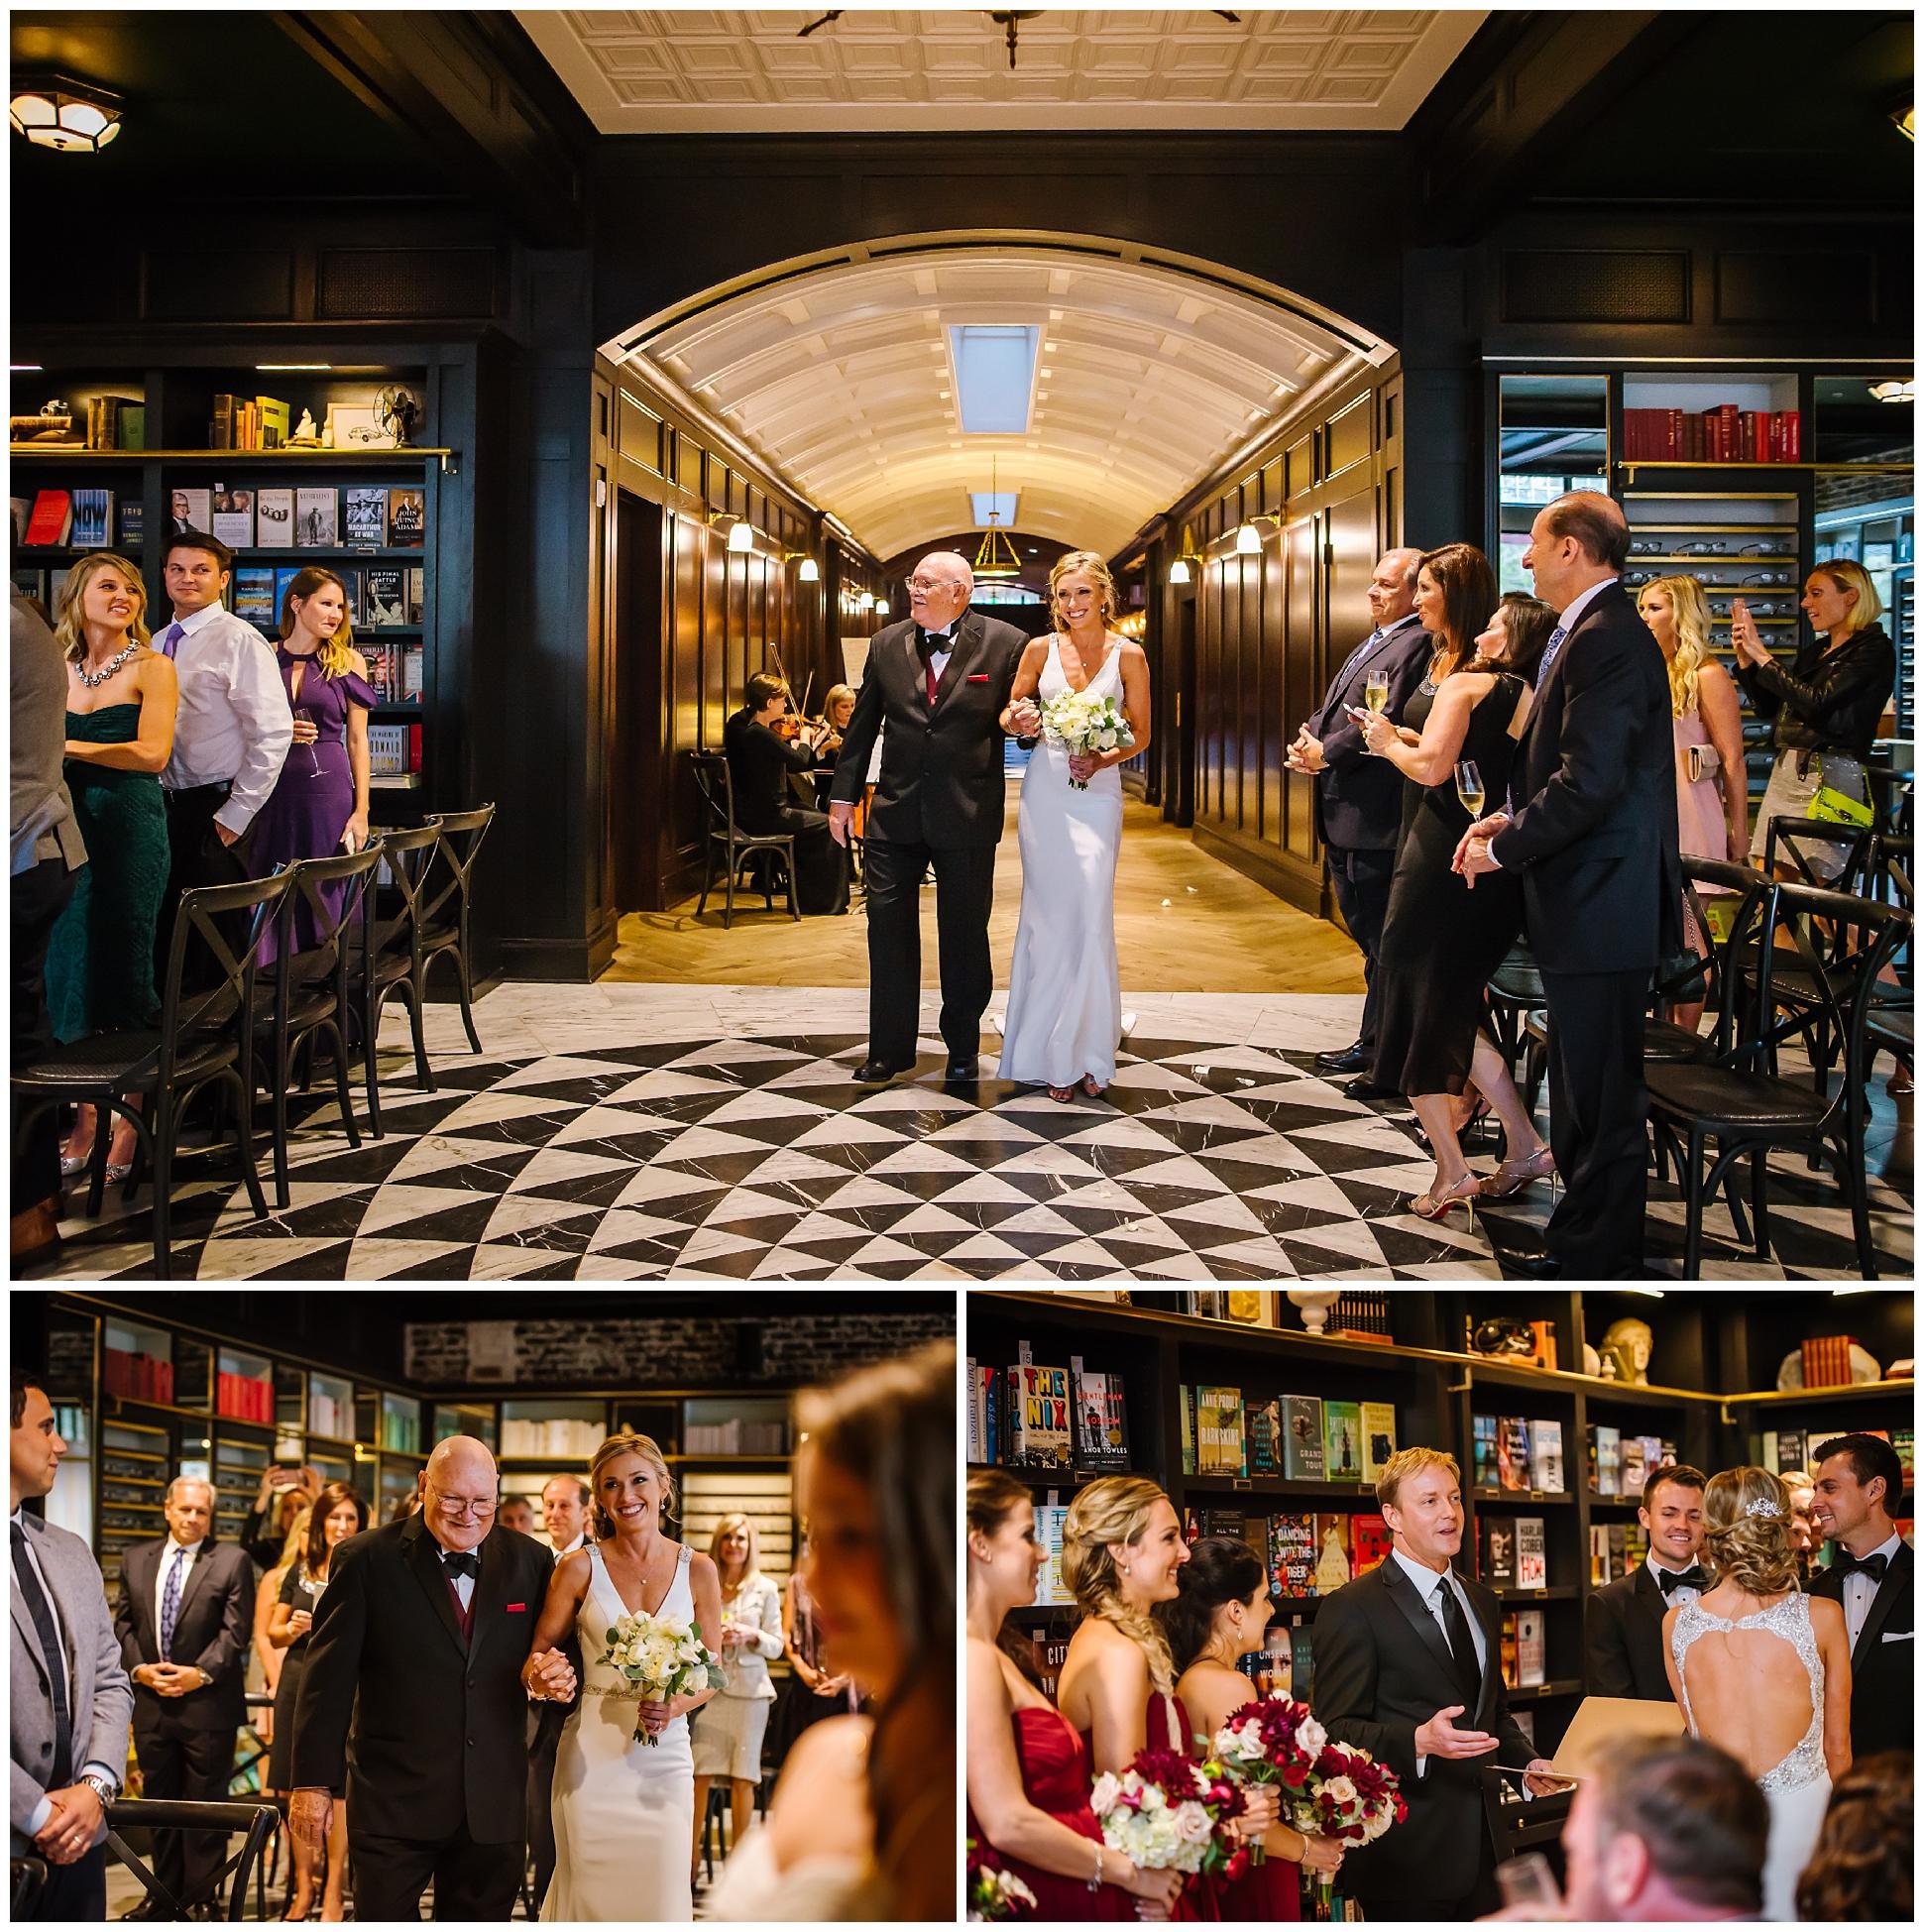 Oxford-exchange-wedding-photogapher-garland-candels-bookstore-burgandy-botanica_0046.jpg